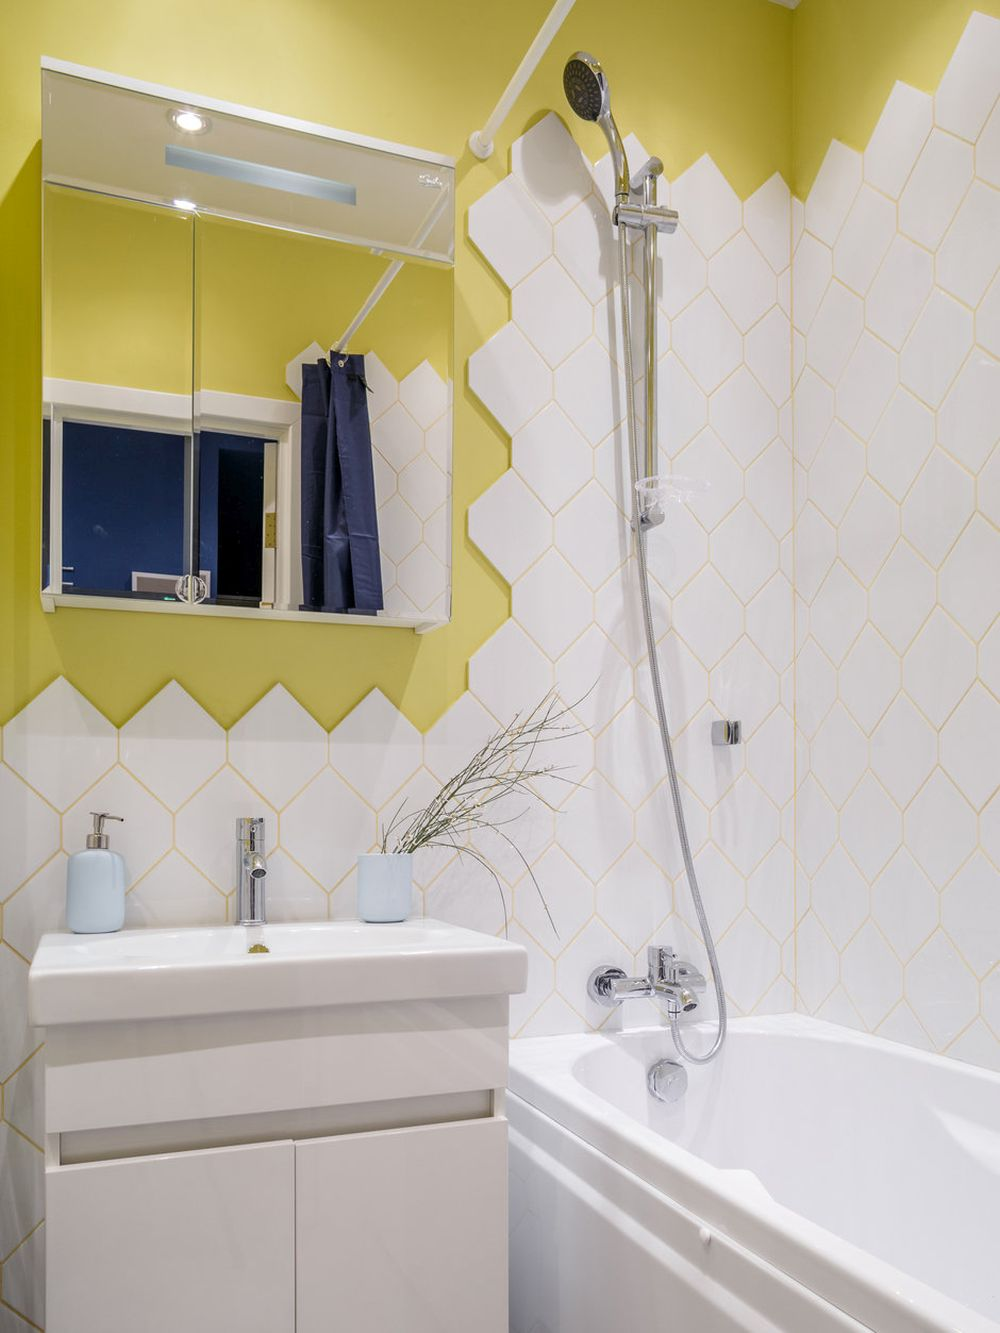 adelaparvu.com despre apartament de 2 camere in 40 mp, design Marina Novikova si Olga Ljubis, Foto Mikhail Loskutov (3)